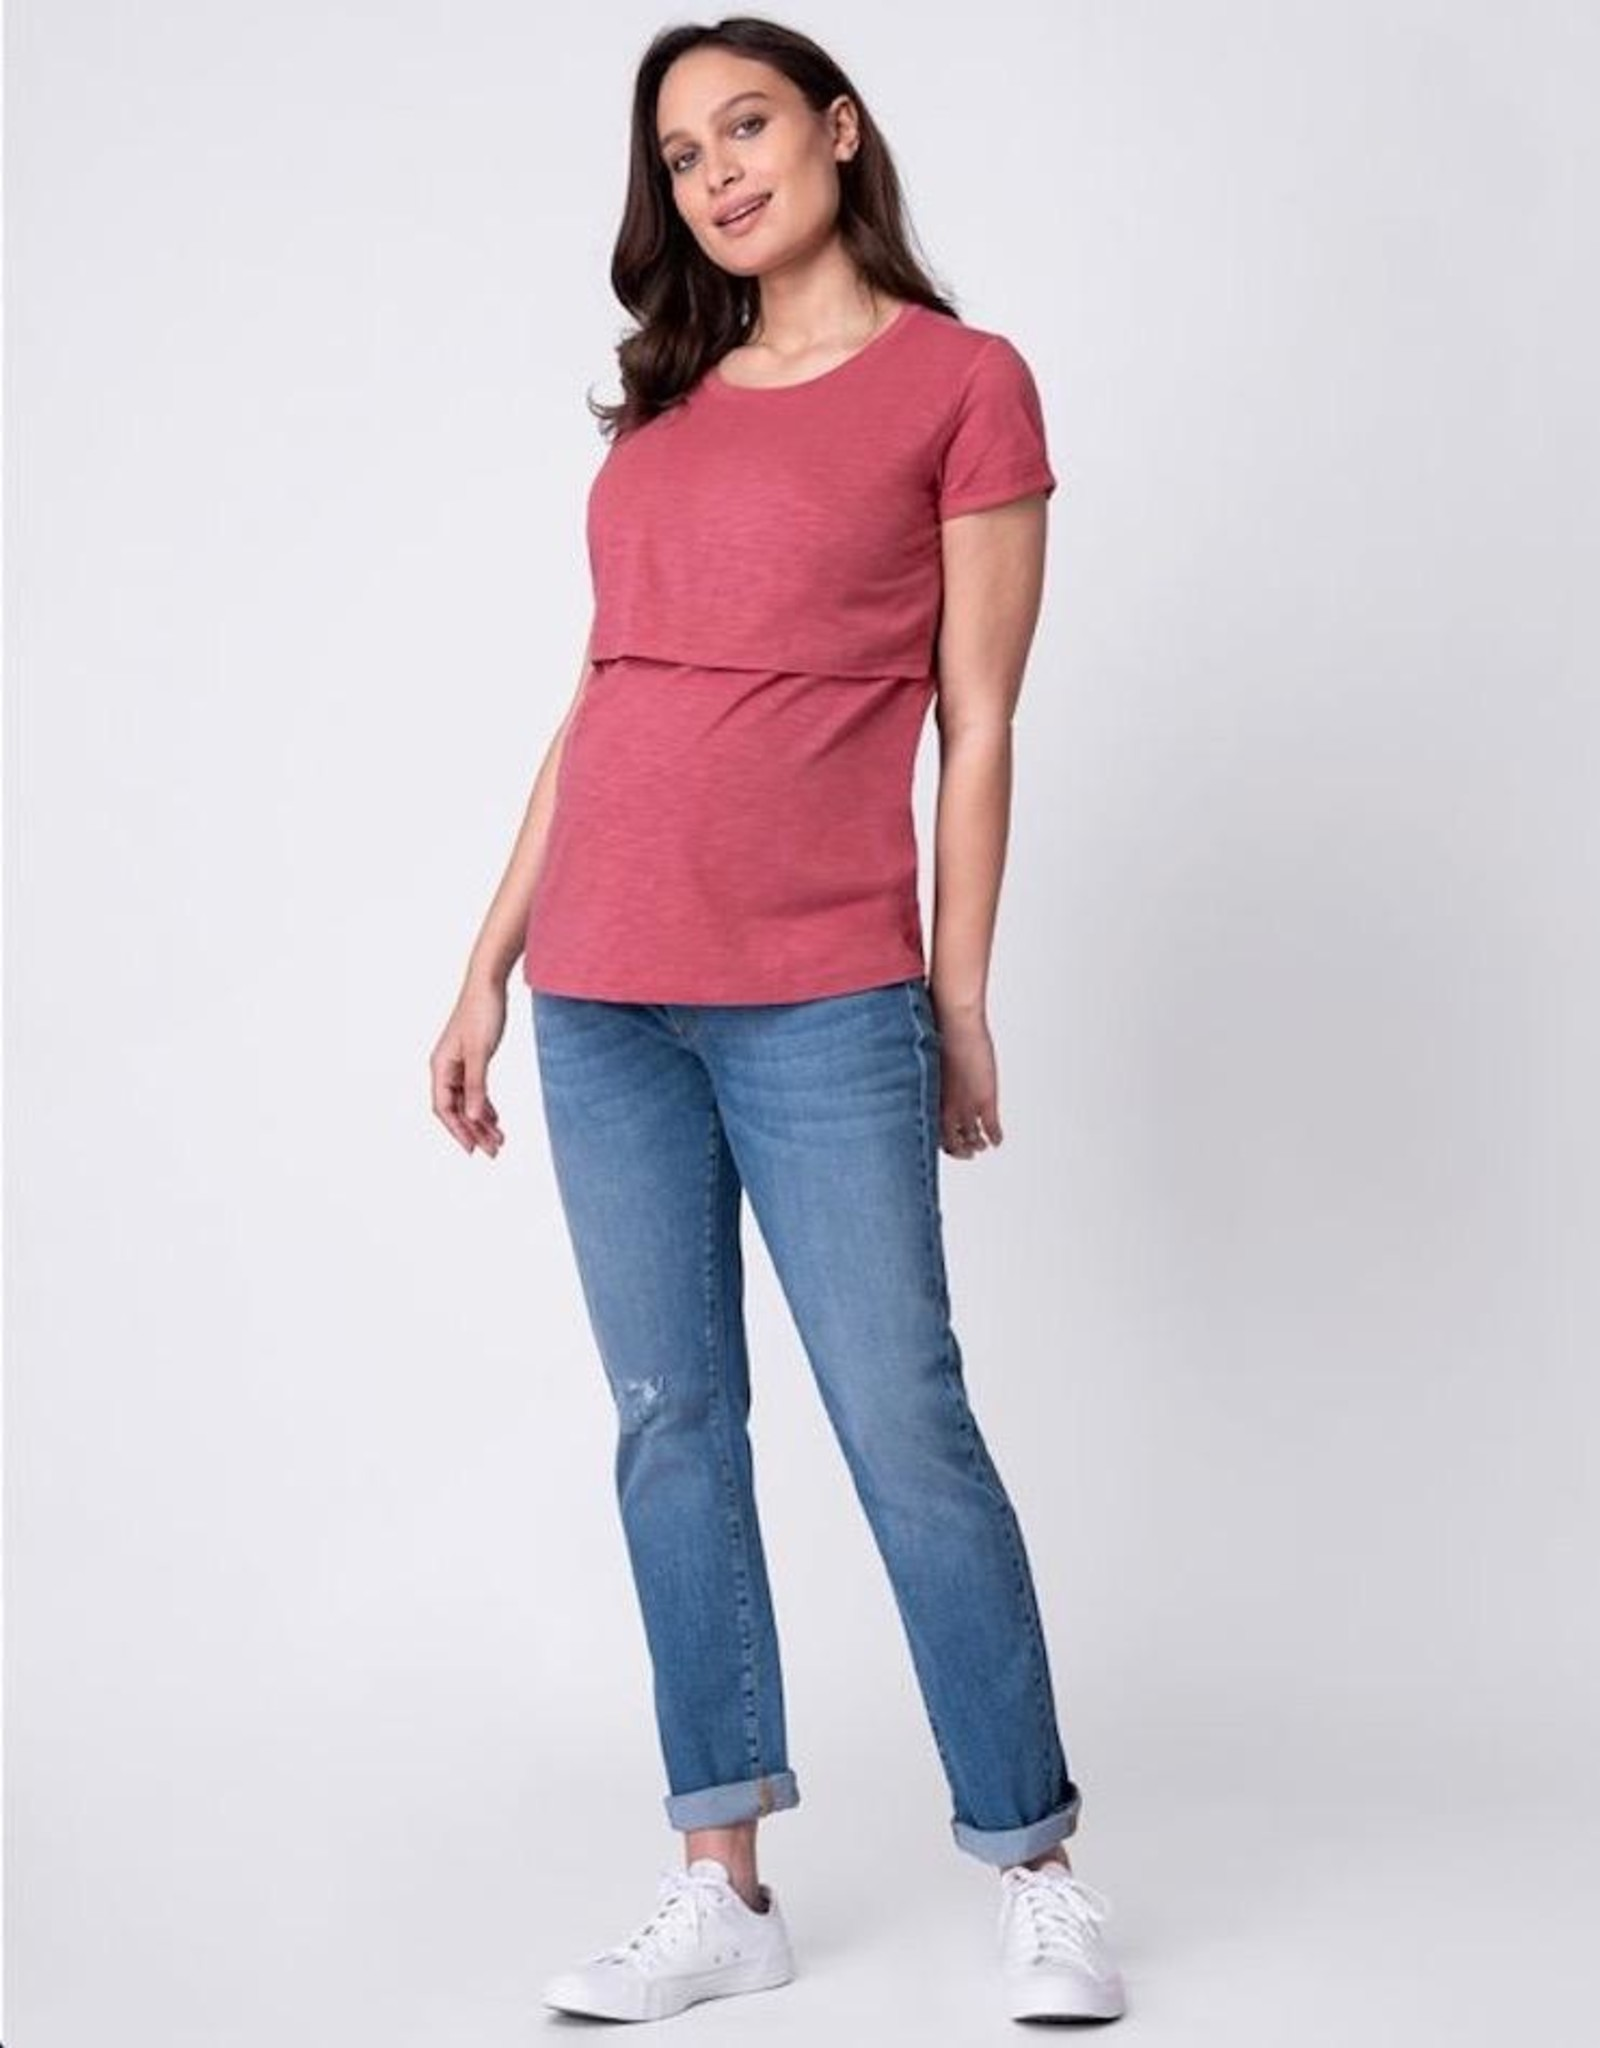 Seraphine Lulu Cotton Maternity & Nursing T-Shirt - Rose